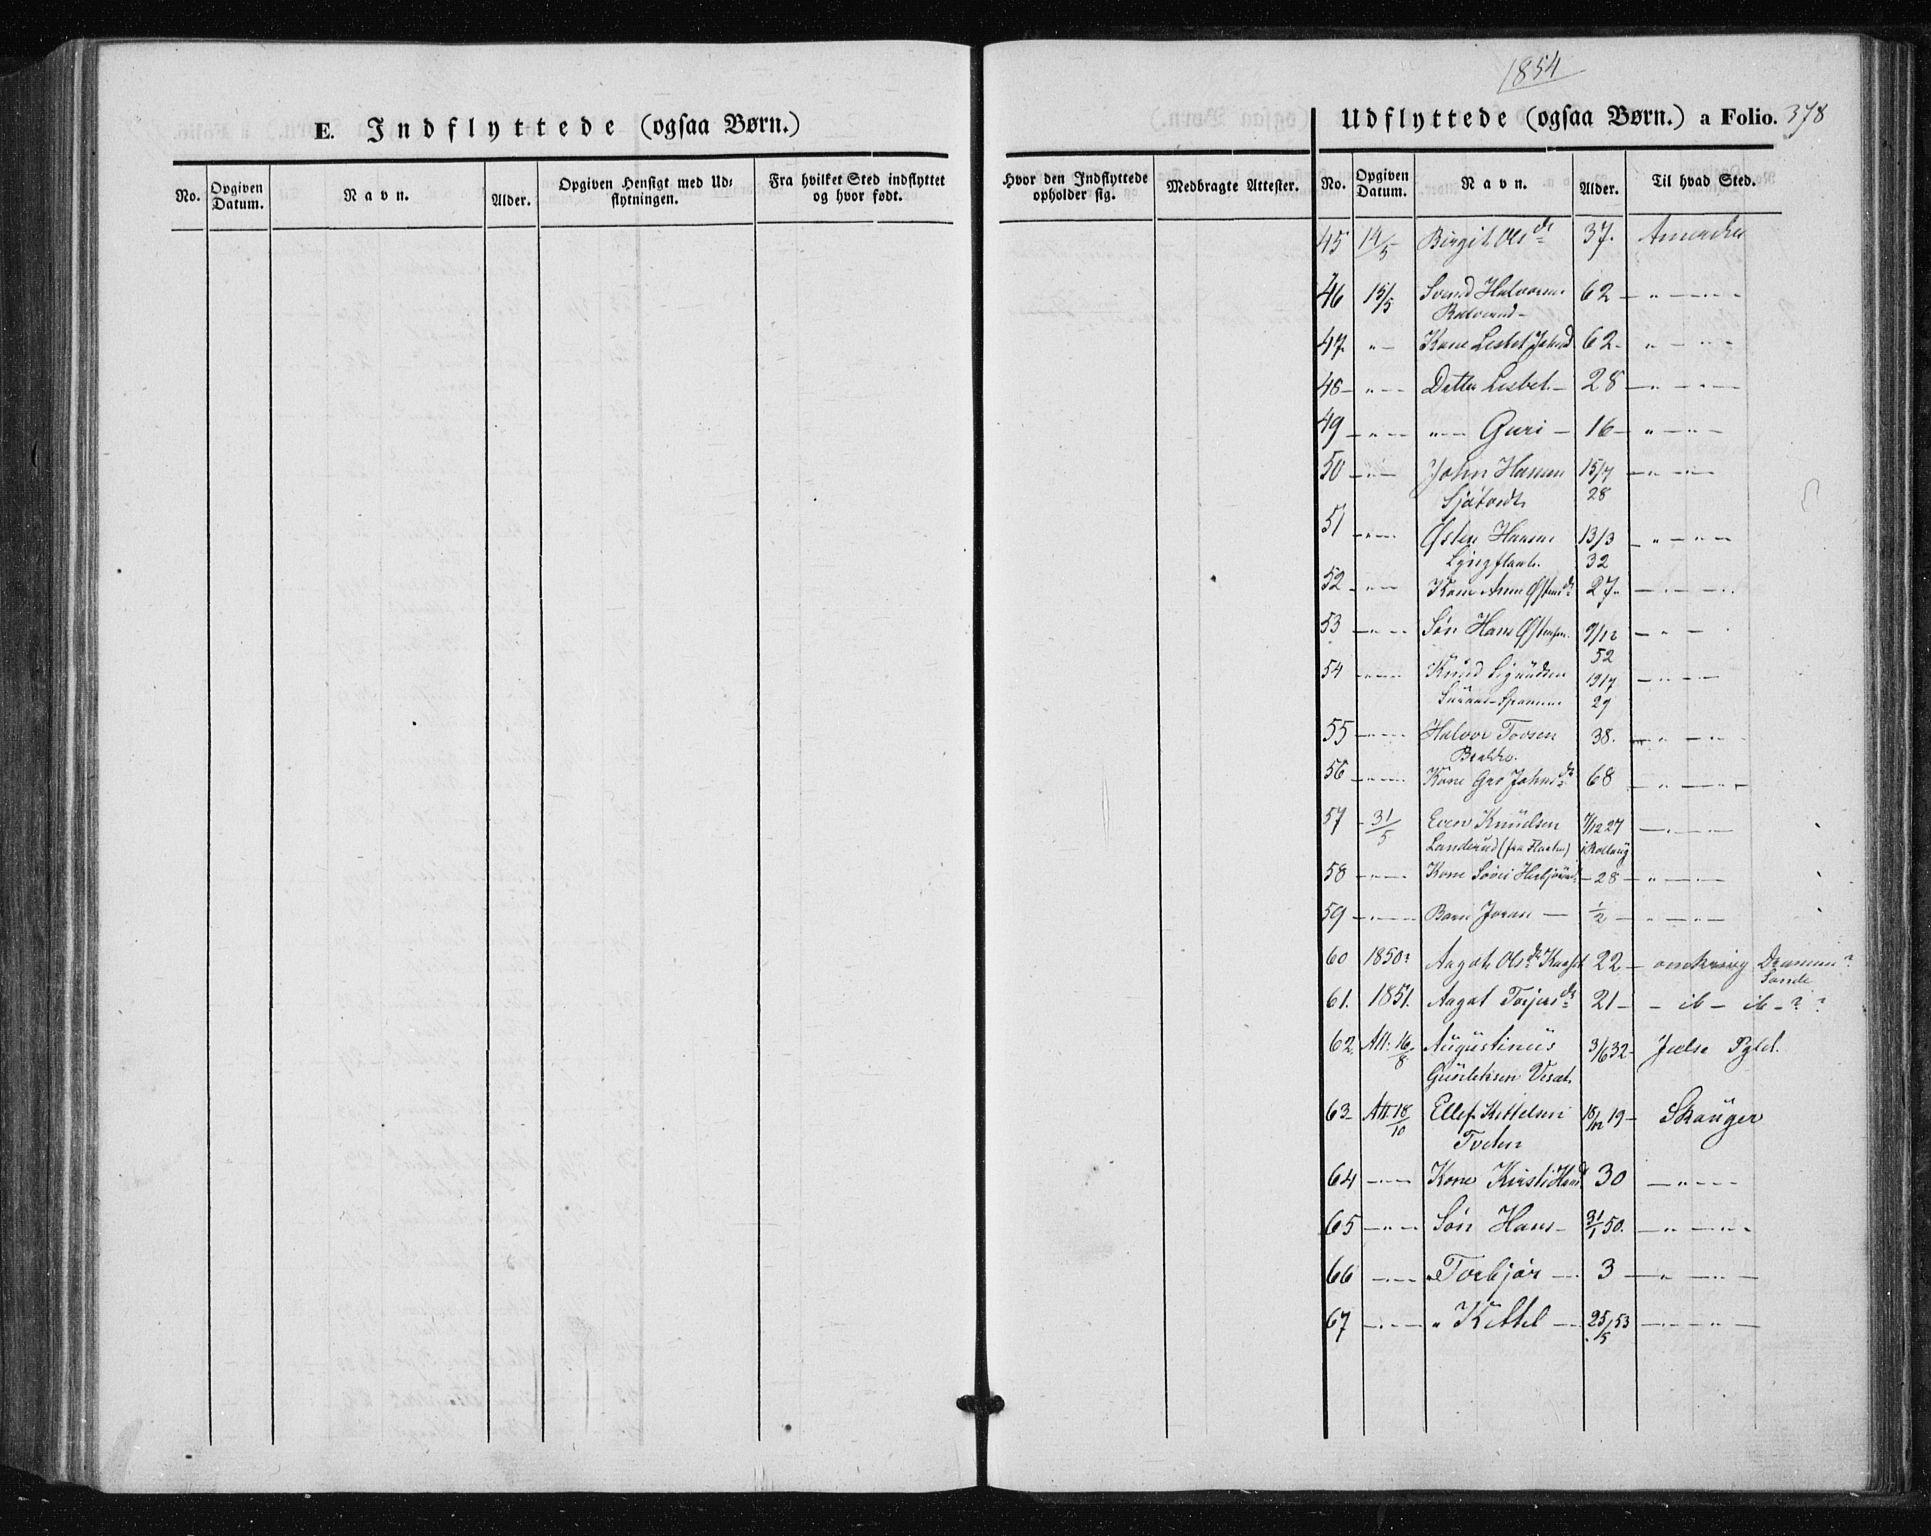 SAKO, Tinn kirkebøker, F/Fa/L0005: Ministerialbok nr. I 5, 1844-1856, s. 378